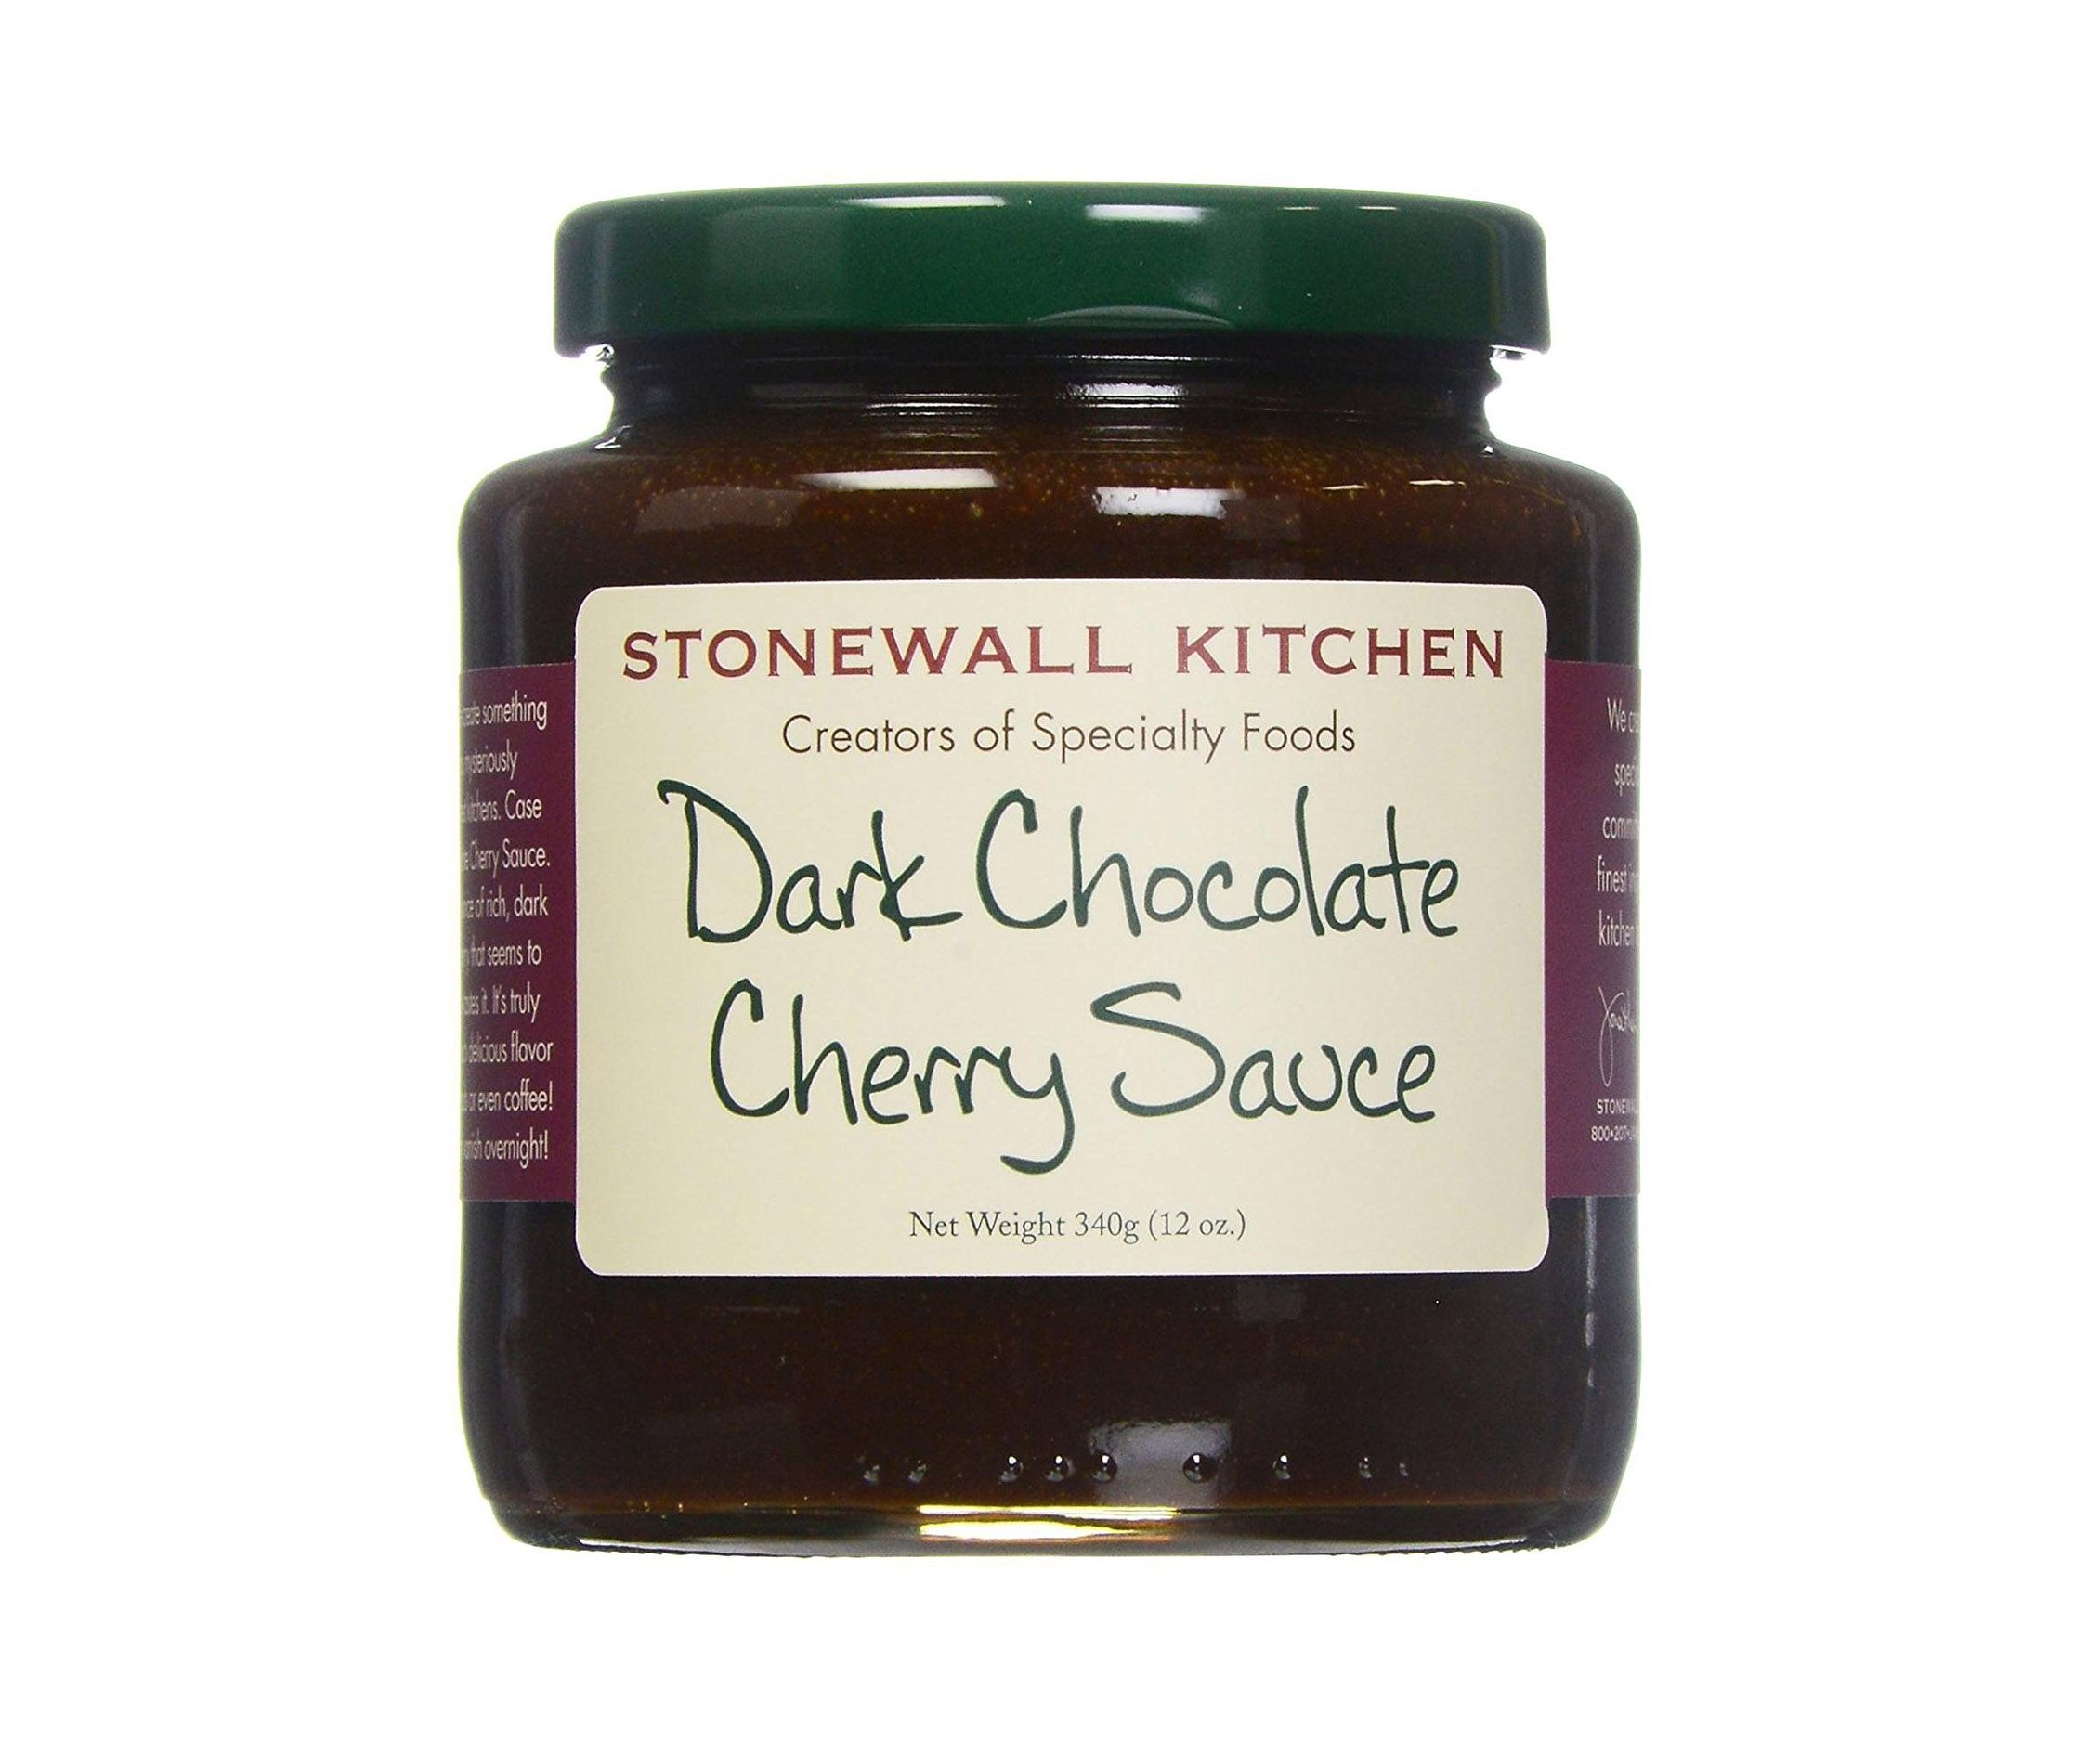 Stonewall Kitchen – Dark Chocolate Cherry Sauce